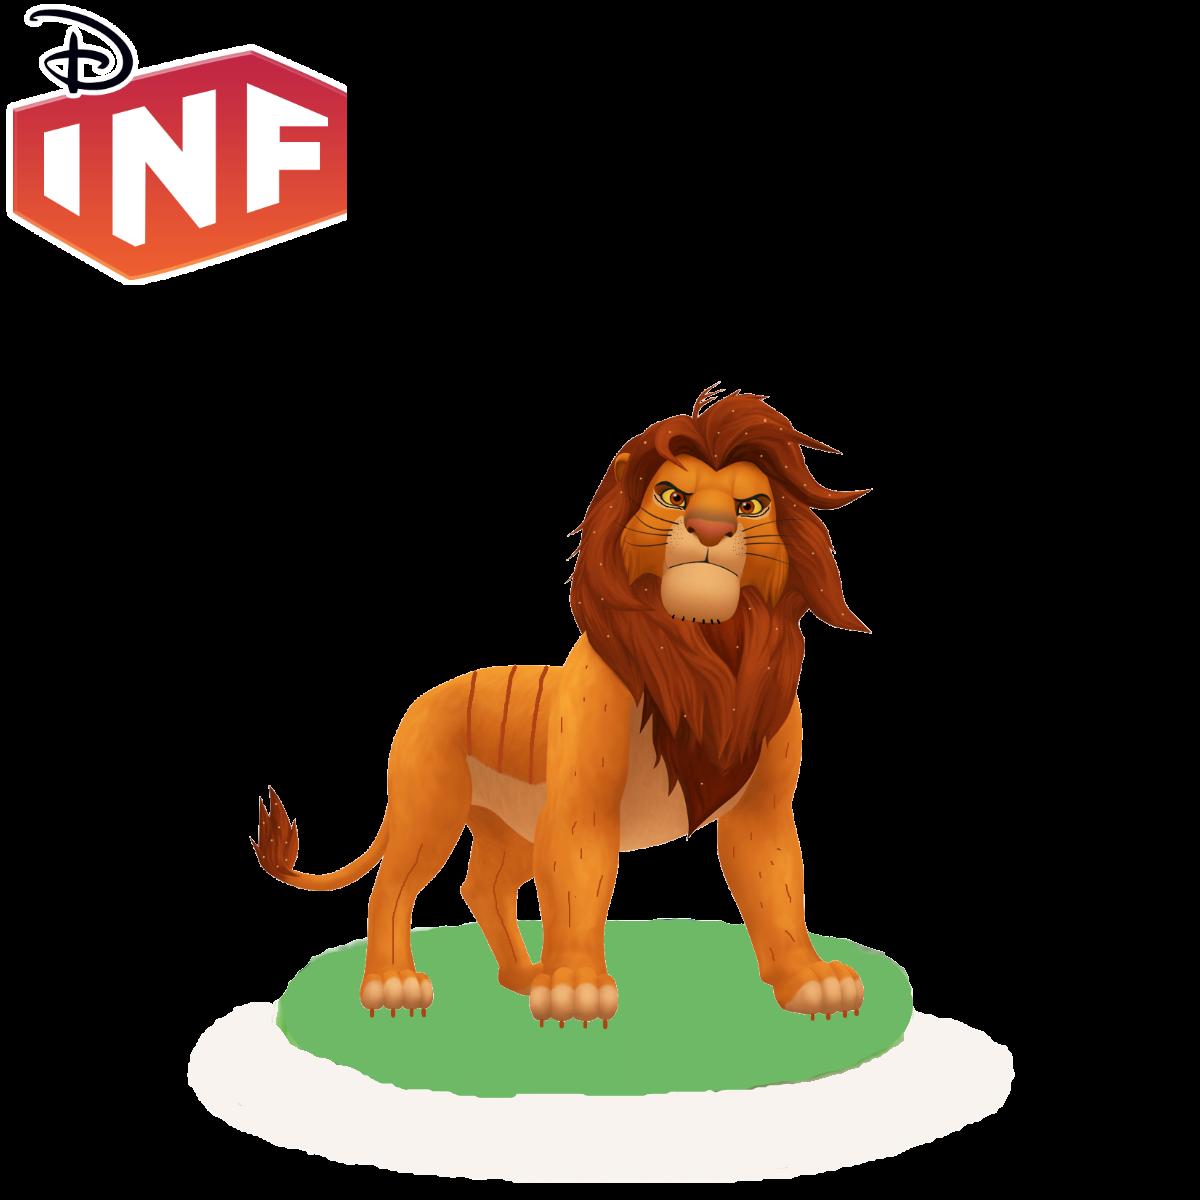 disney infinity lion king - photo #20